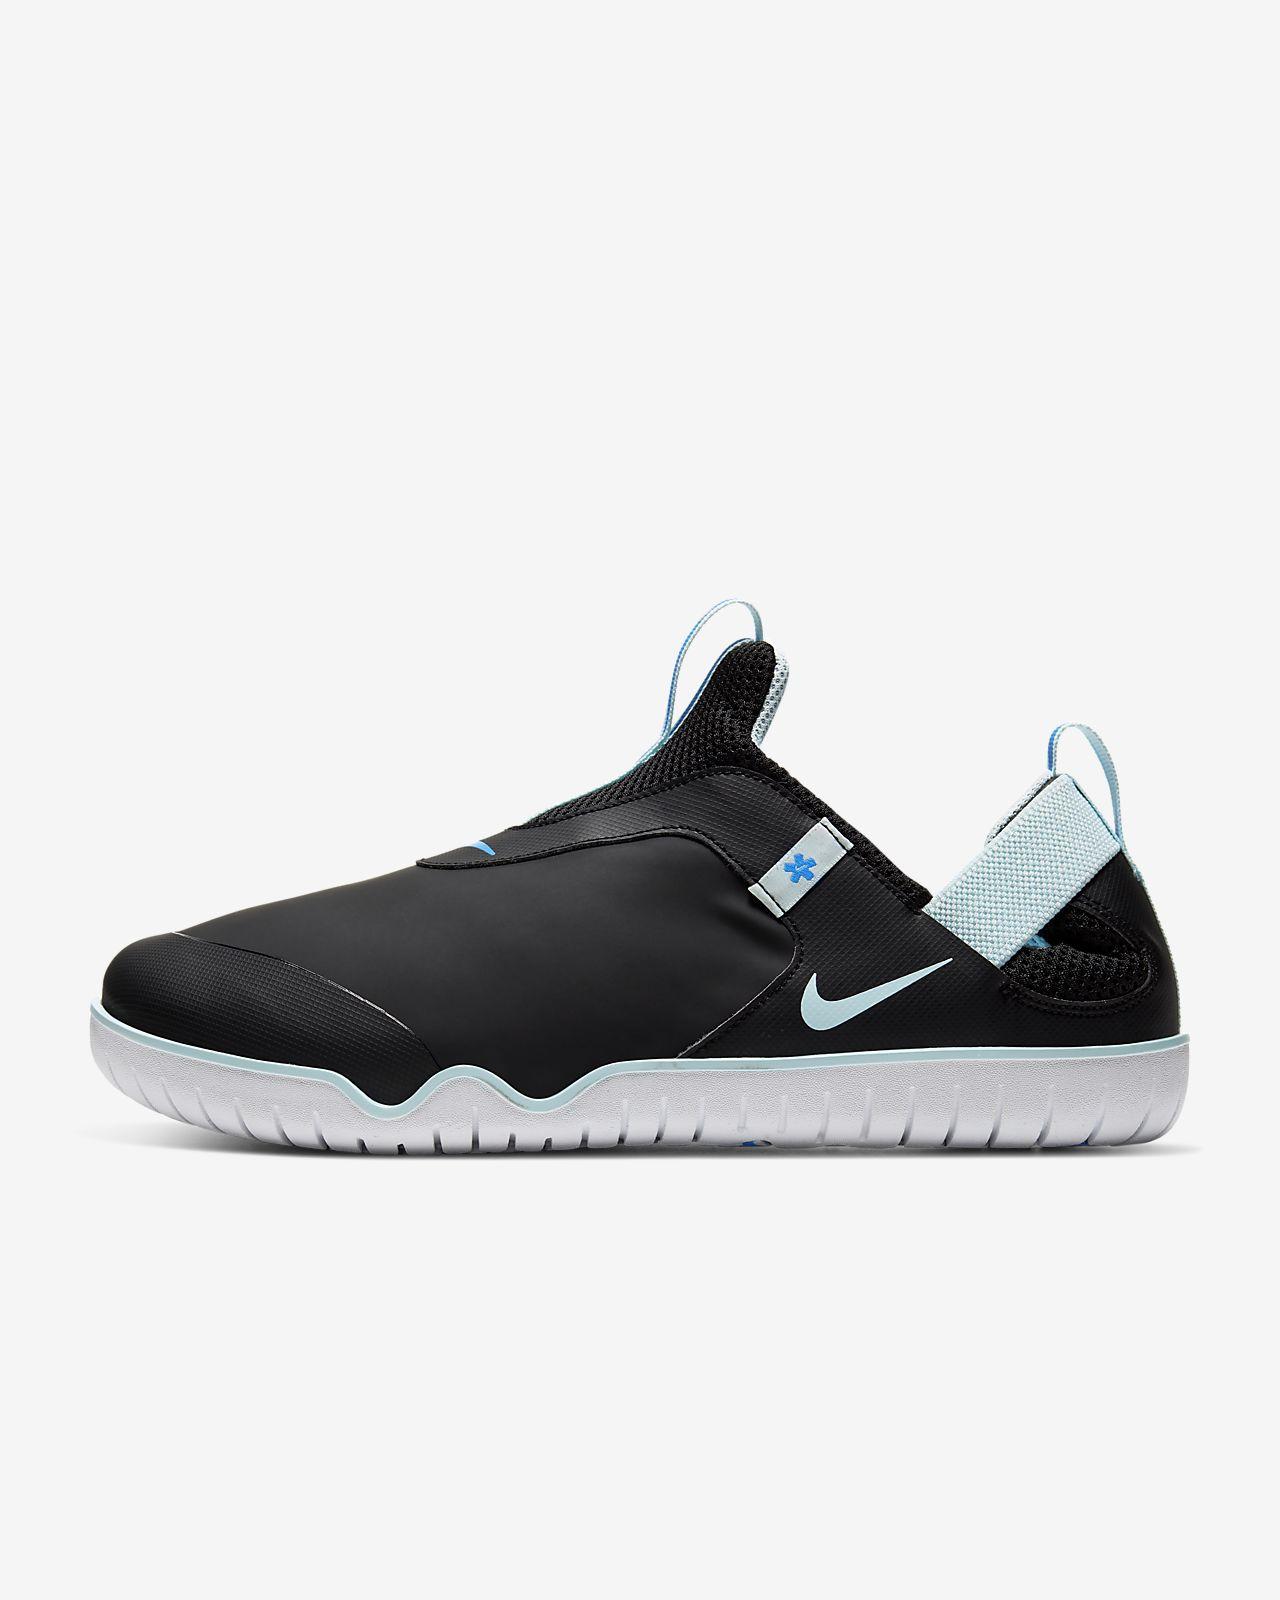 Nike Air Zoom Pulse Shoe